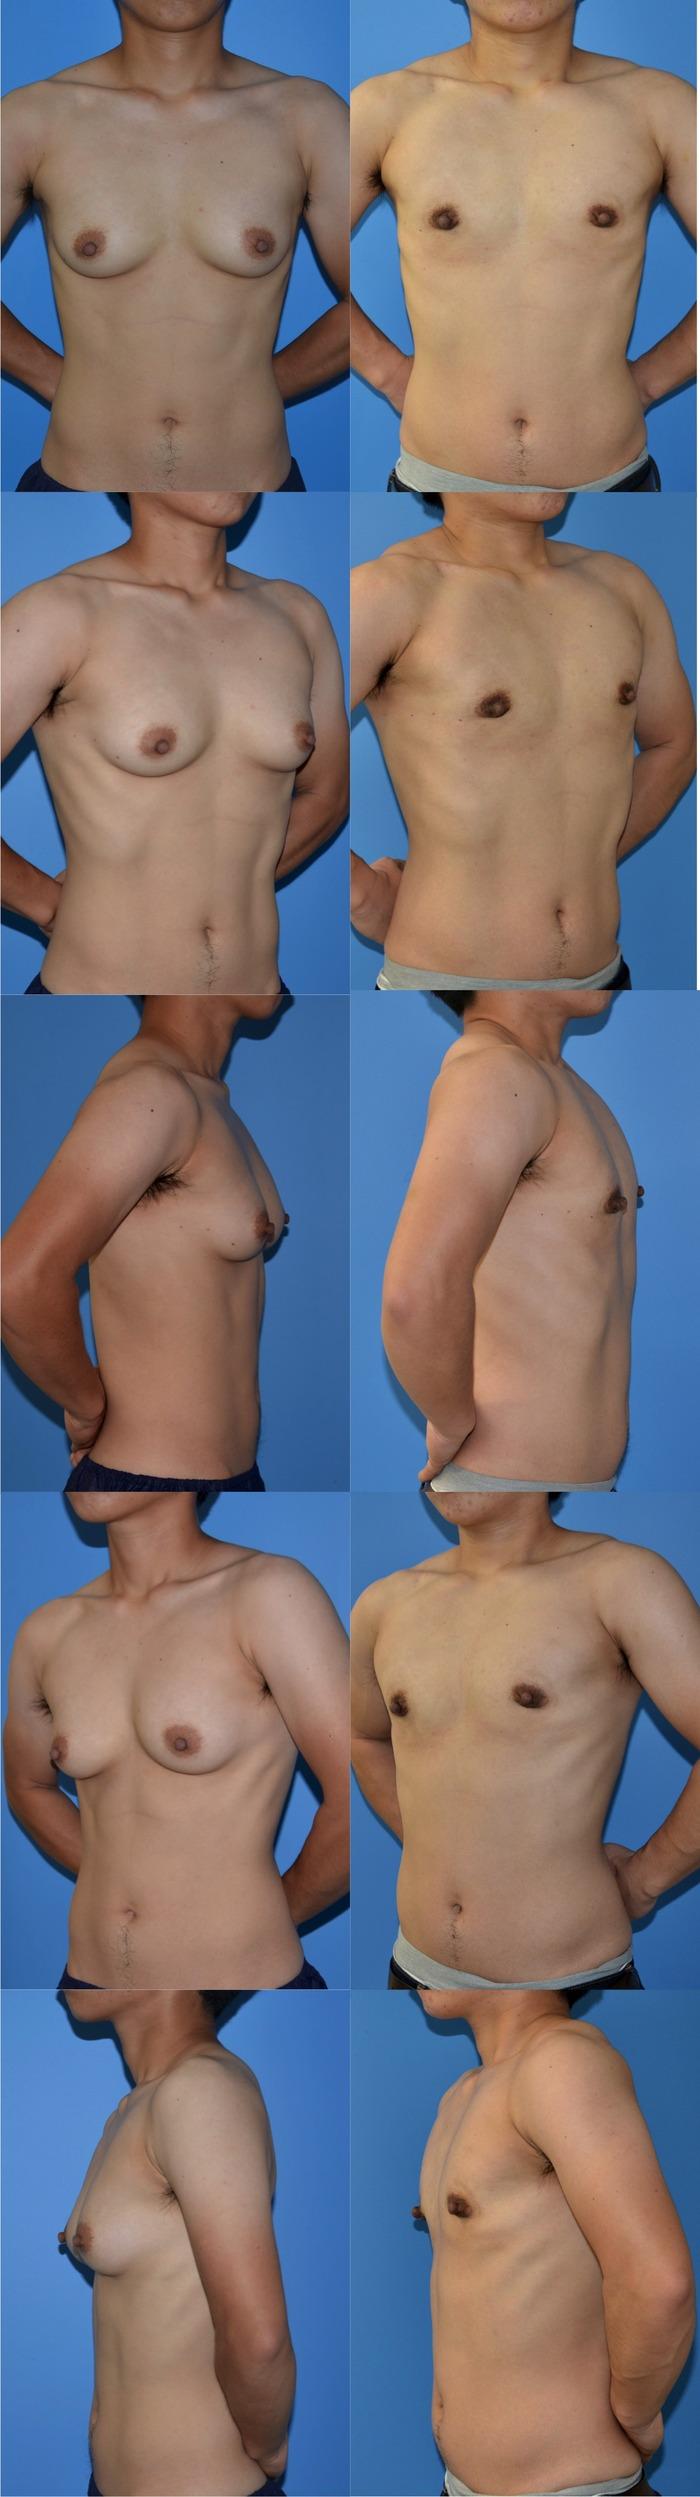 乳腺切除術md7ヶ月